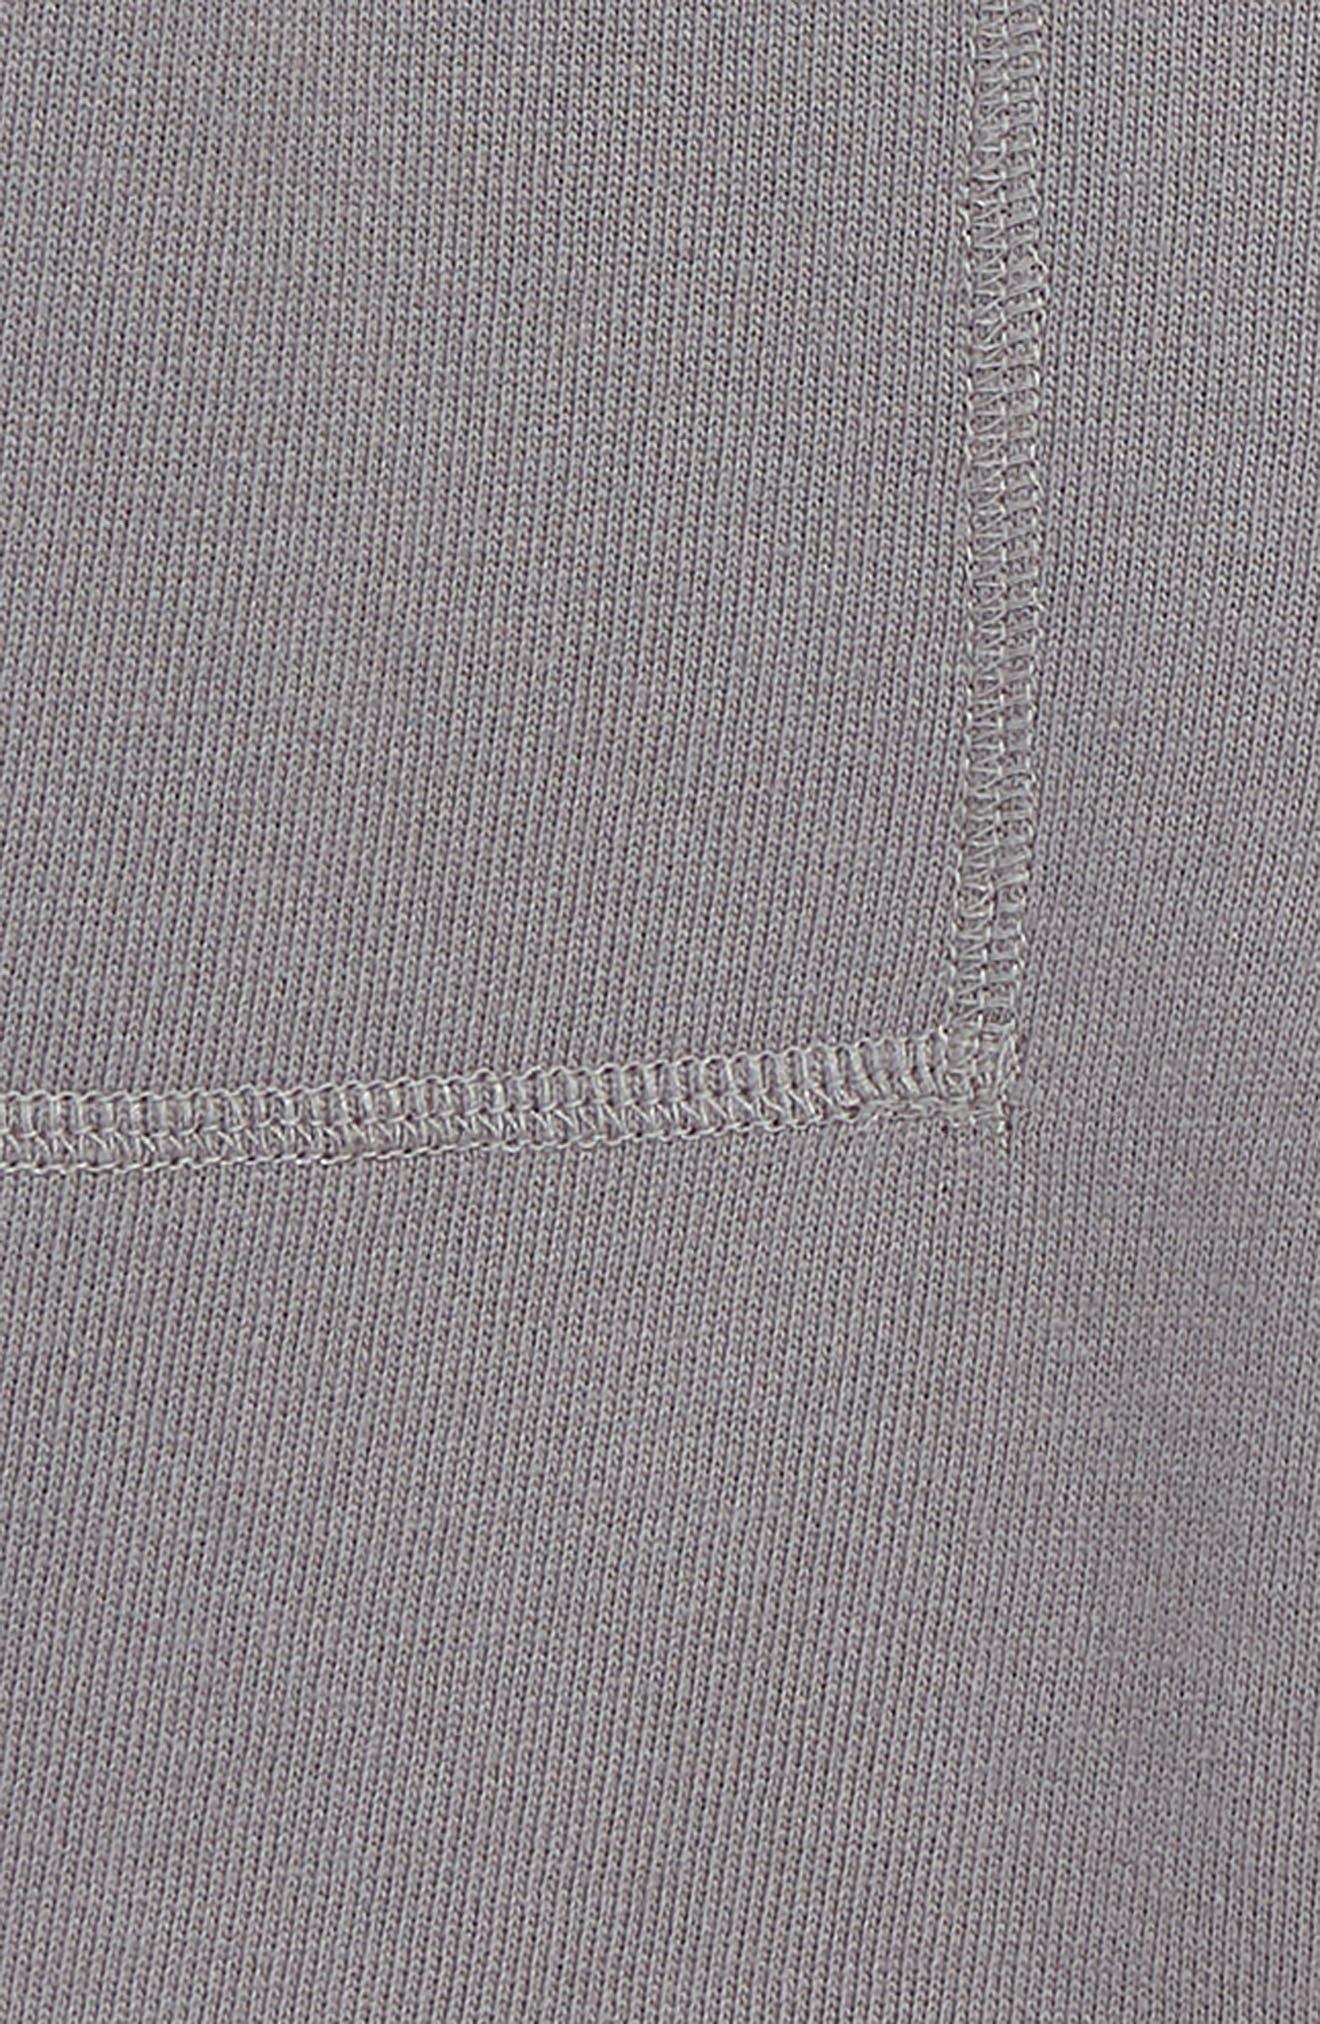 MINI BODEN,                             Garment Dyed Sweat Shorts,                             Alternate thumbnail 2, color,                             PEWTER GREY